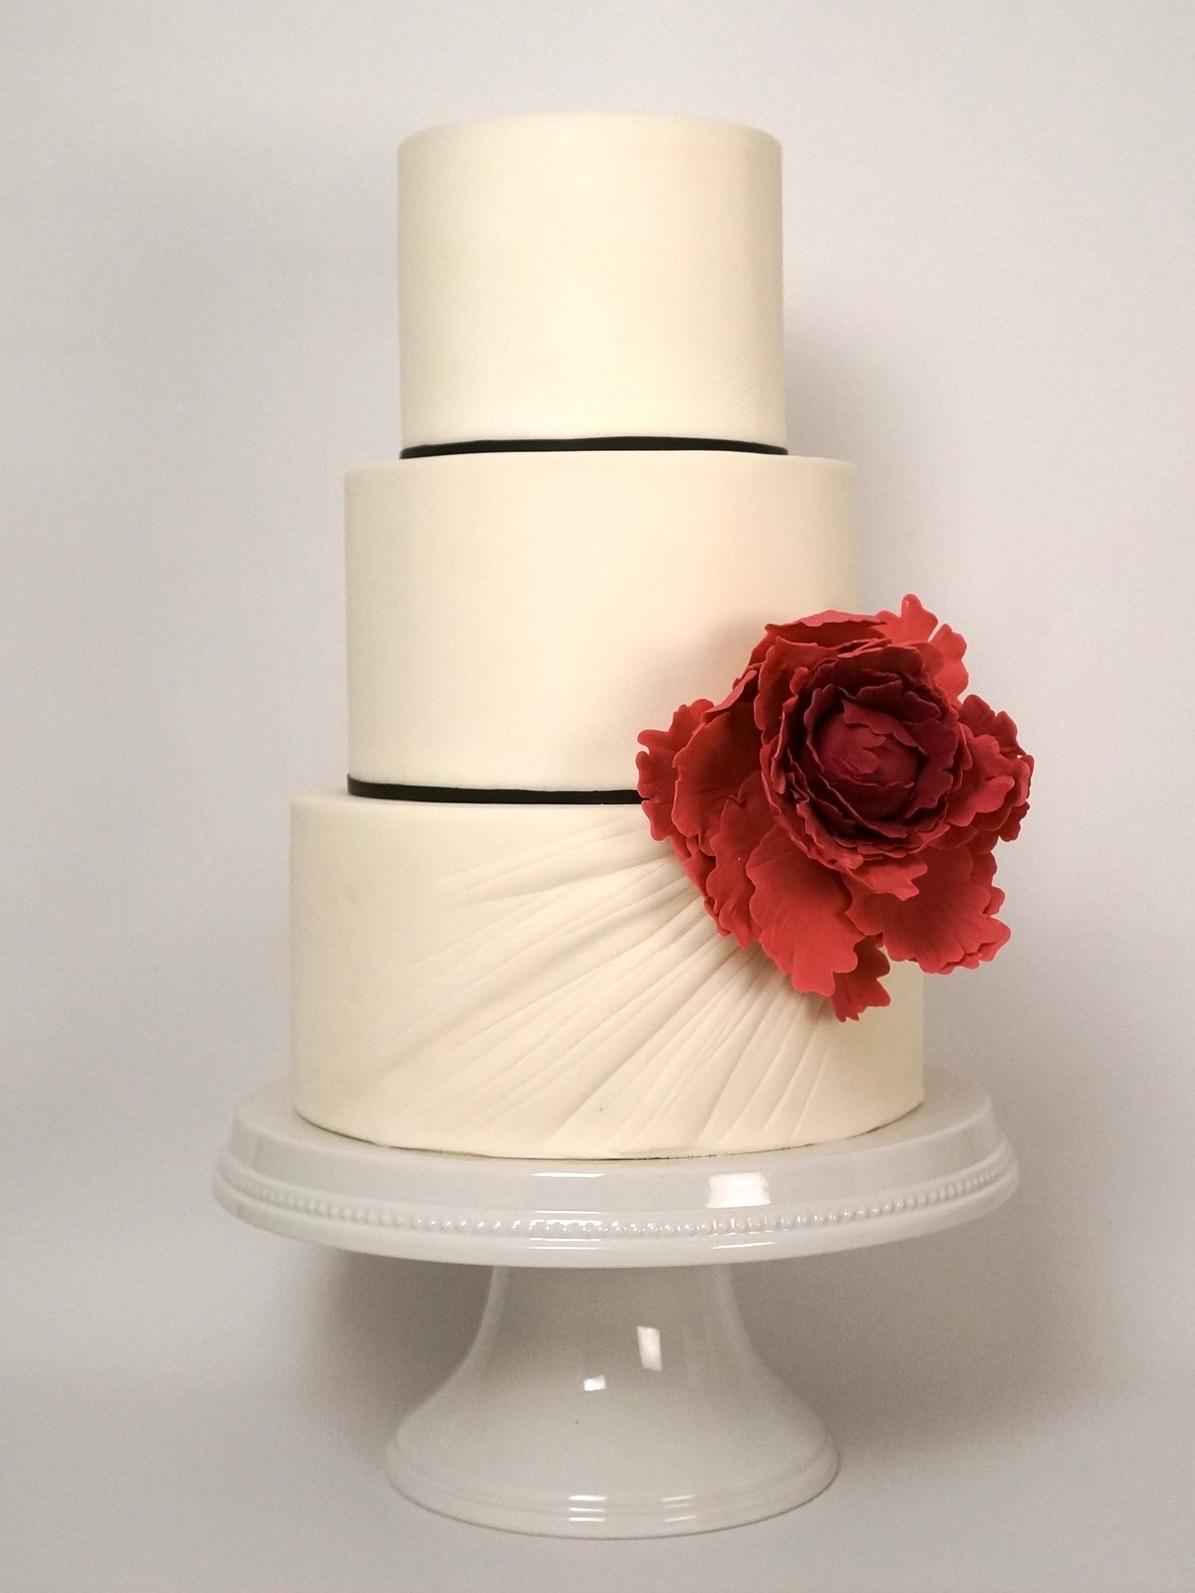 ruched-peony-flower-red-black-white-wedding-cake-baltimore-maryland.jpg